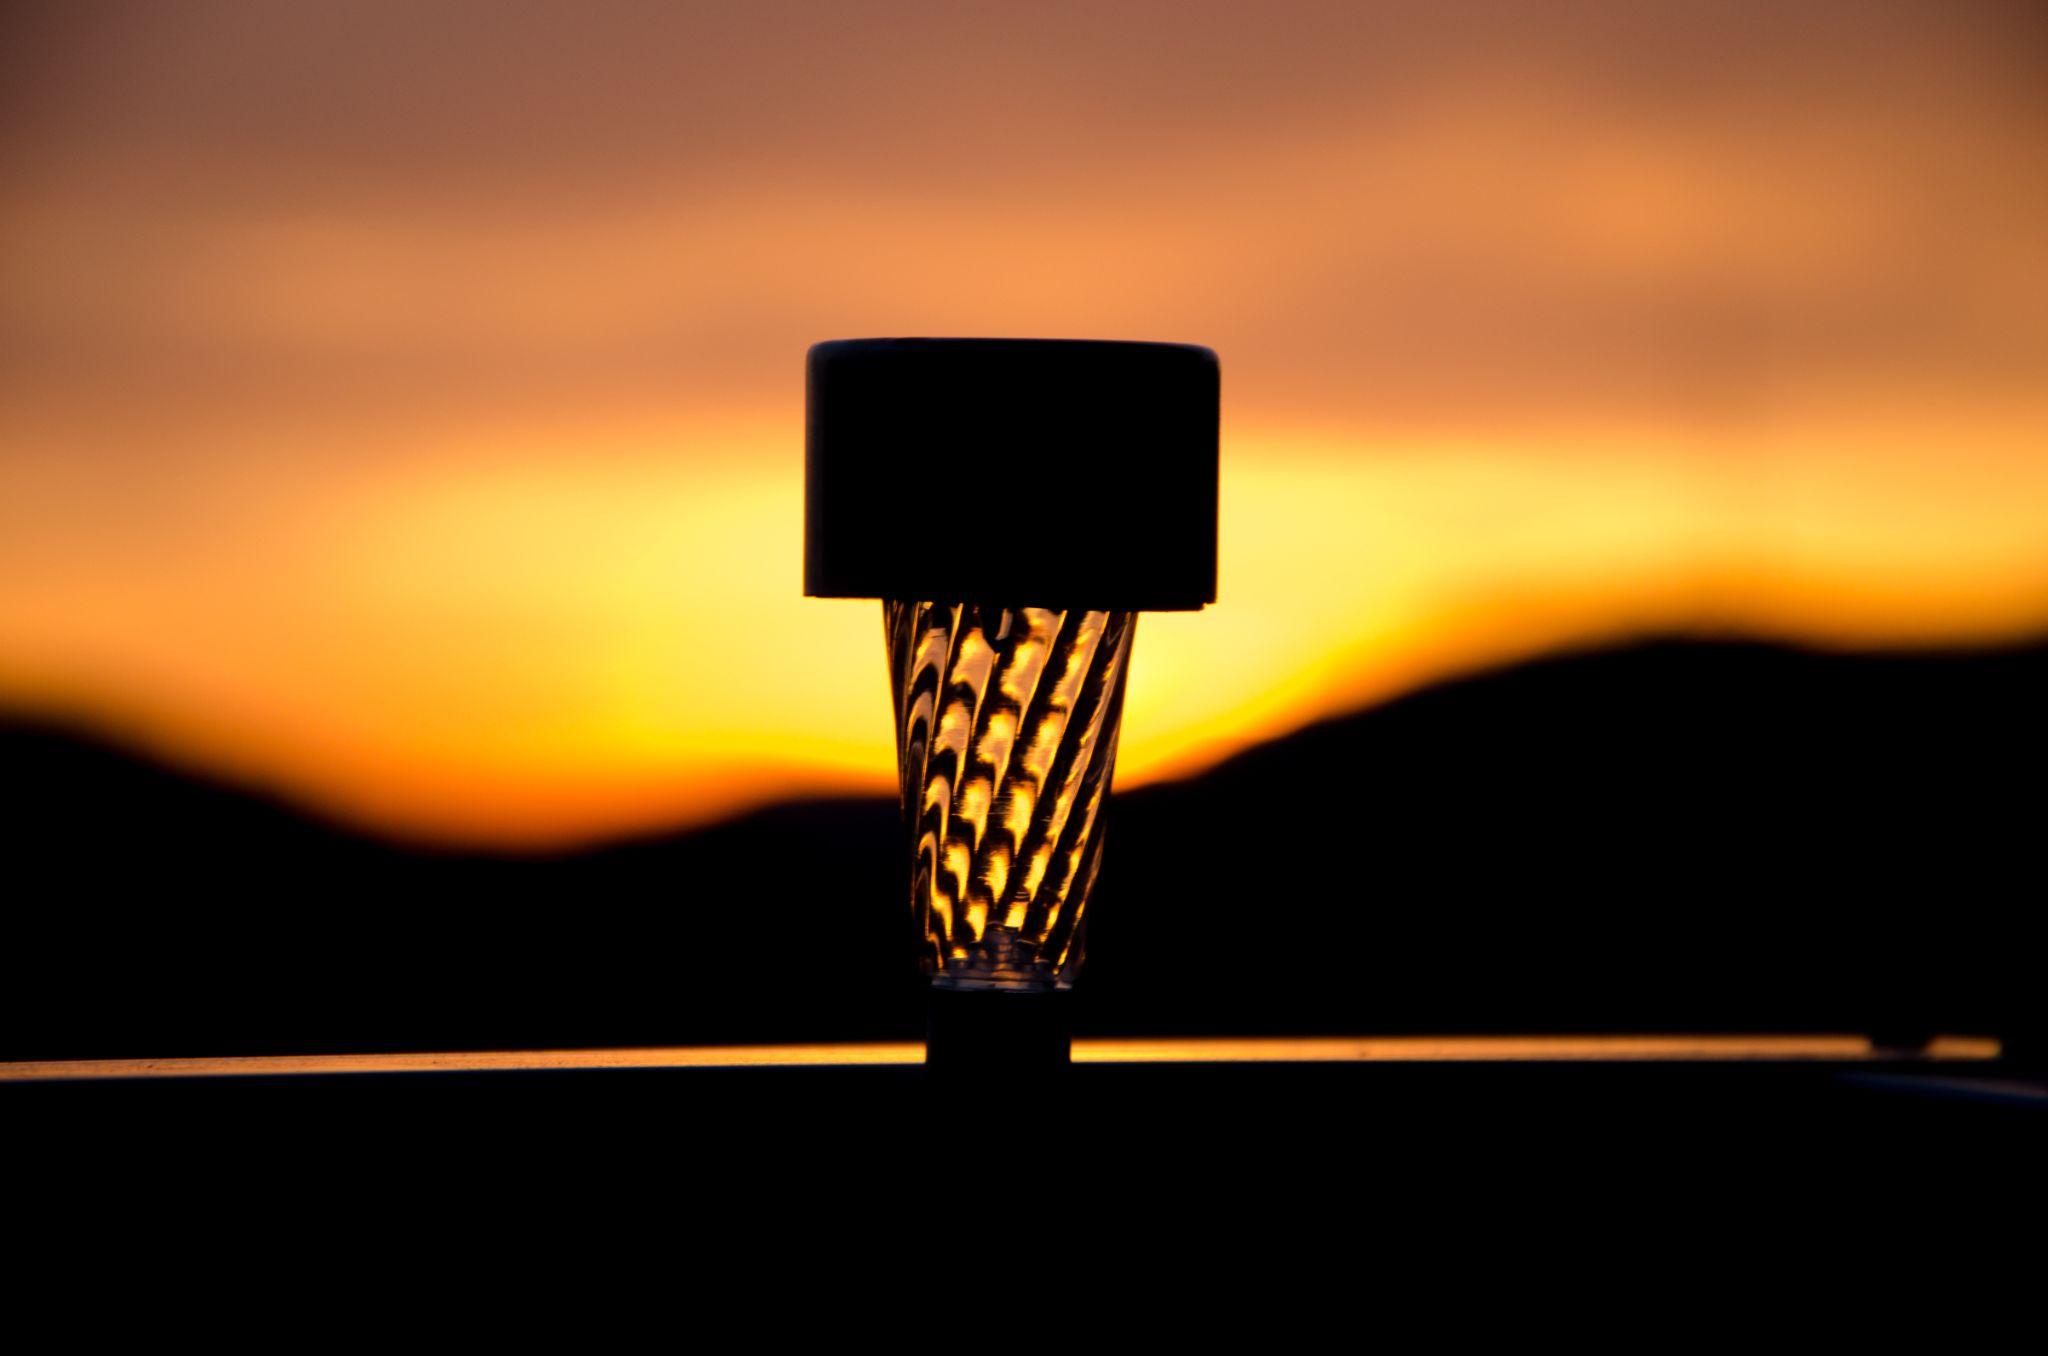 sunset lamp by Shoayb